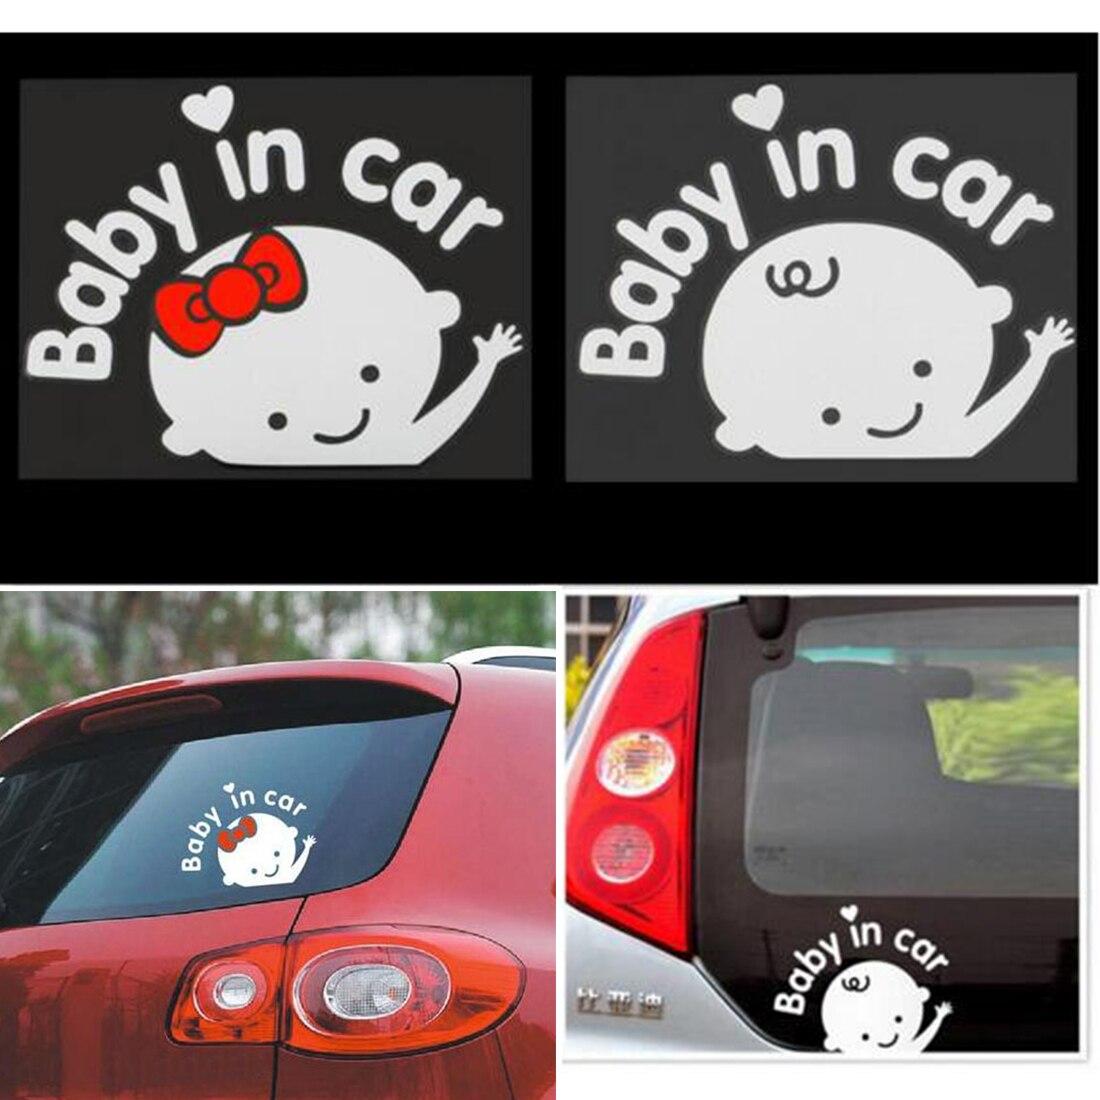 hot New 3D Cartoon Car Stickers Reflective Vinyl Car Styling Baby In Car Warming Car Sticker Baby on Board On Rear Windshield